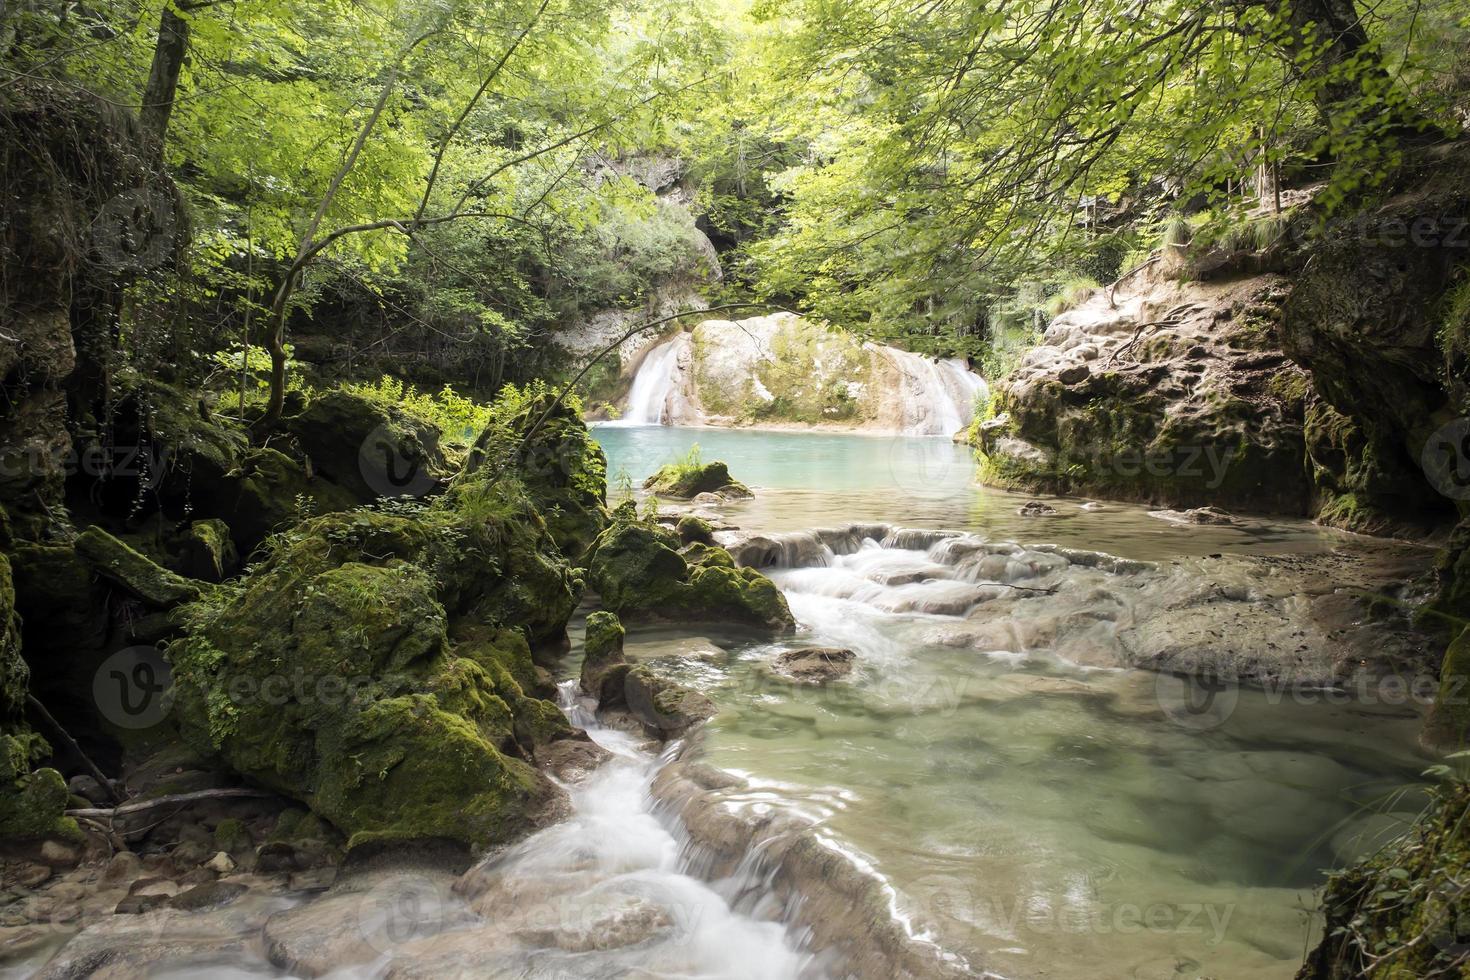 Urredera River - Navarra, Spain photo